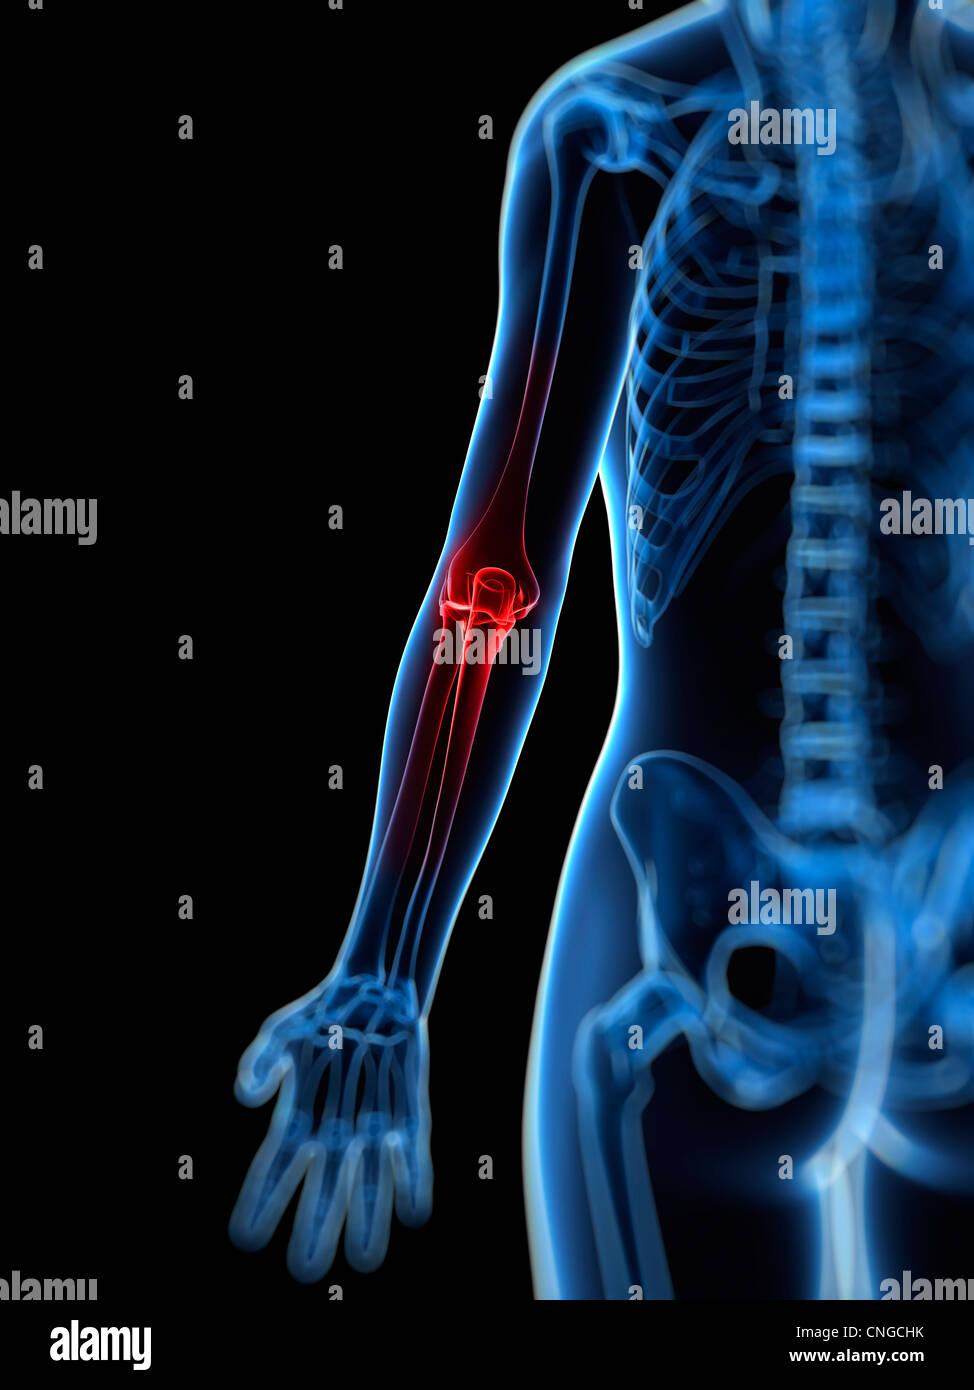 Human Elbow Joint Pain Computer Stock Photos & Human Elbow Joint ...